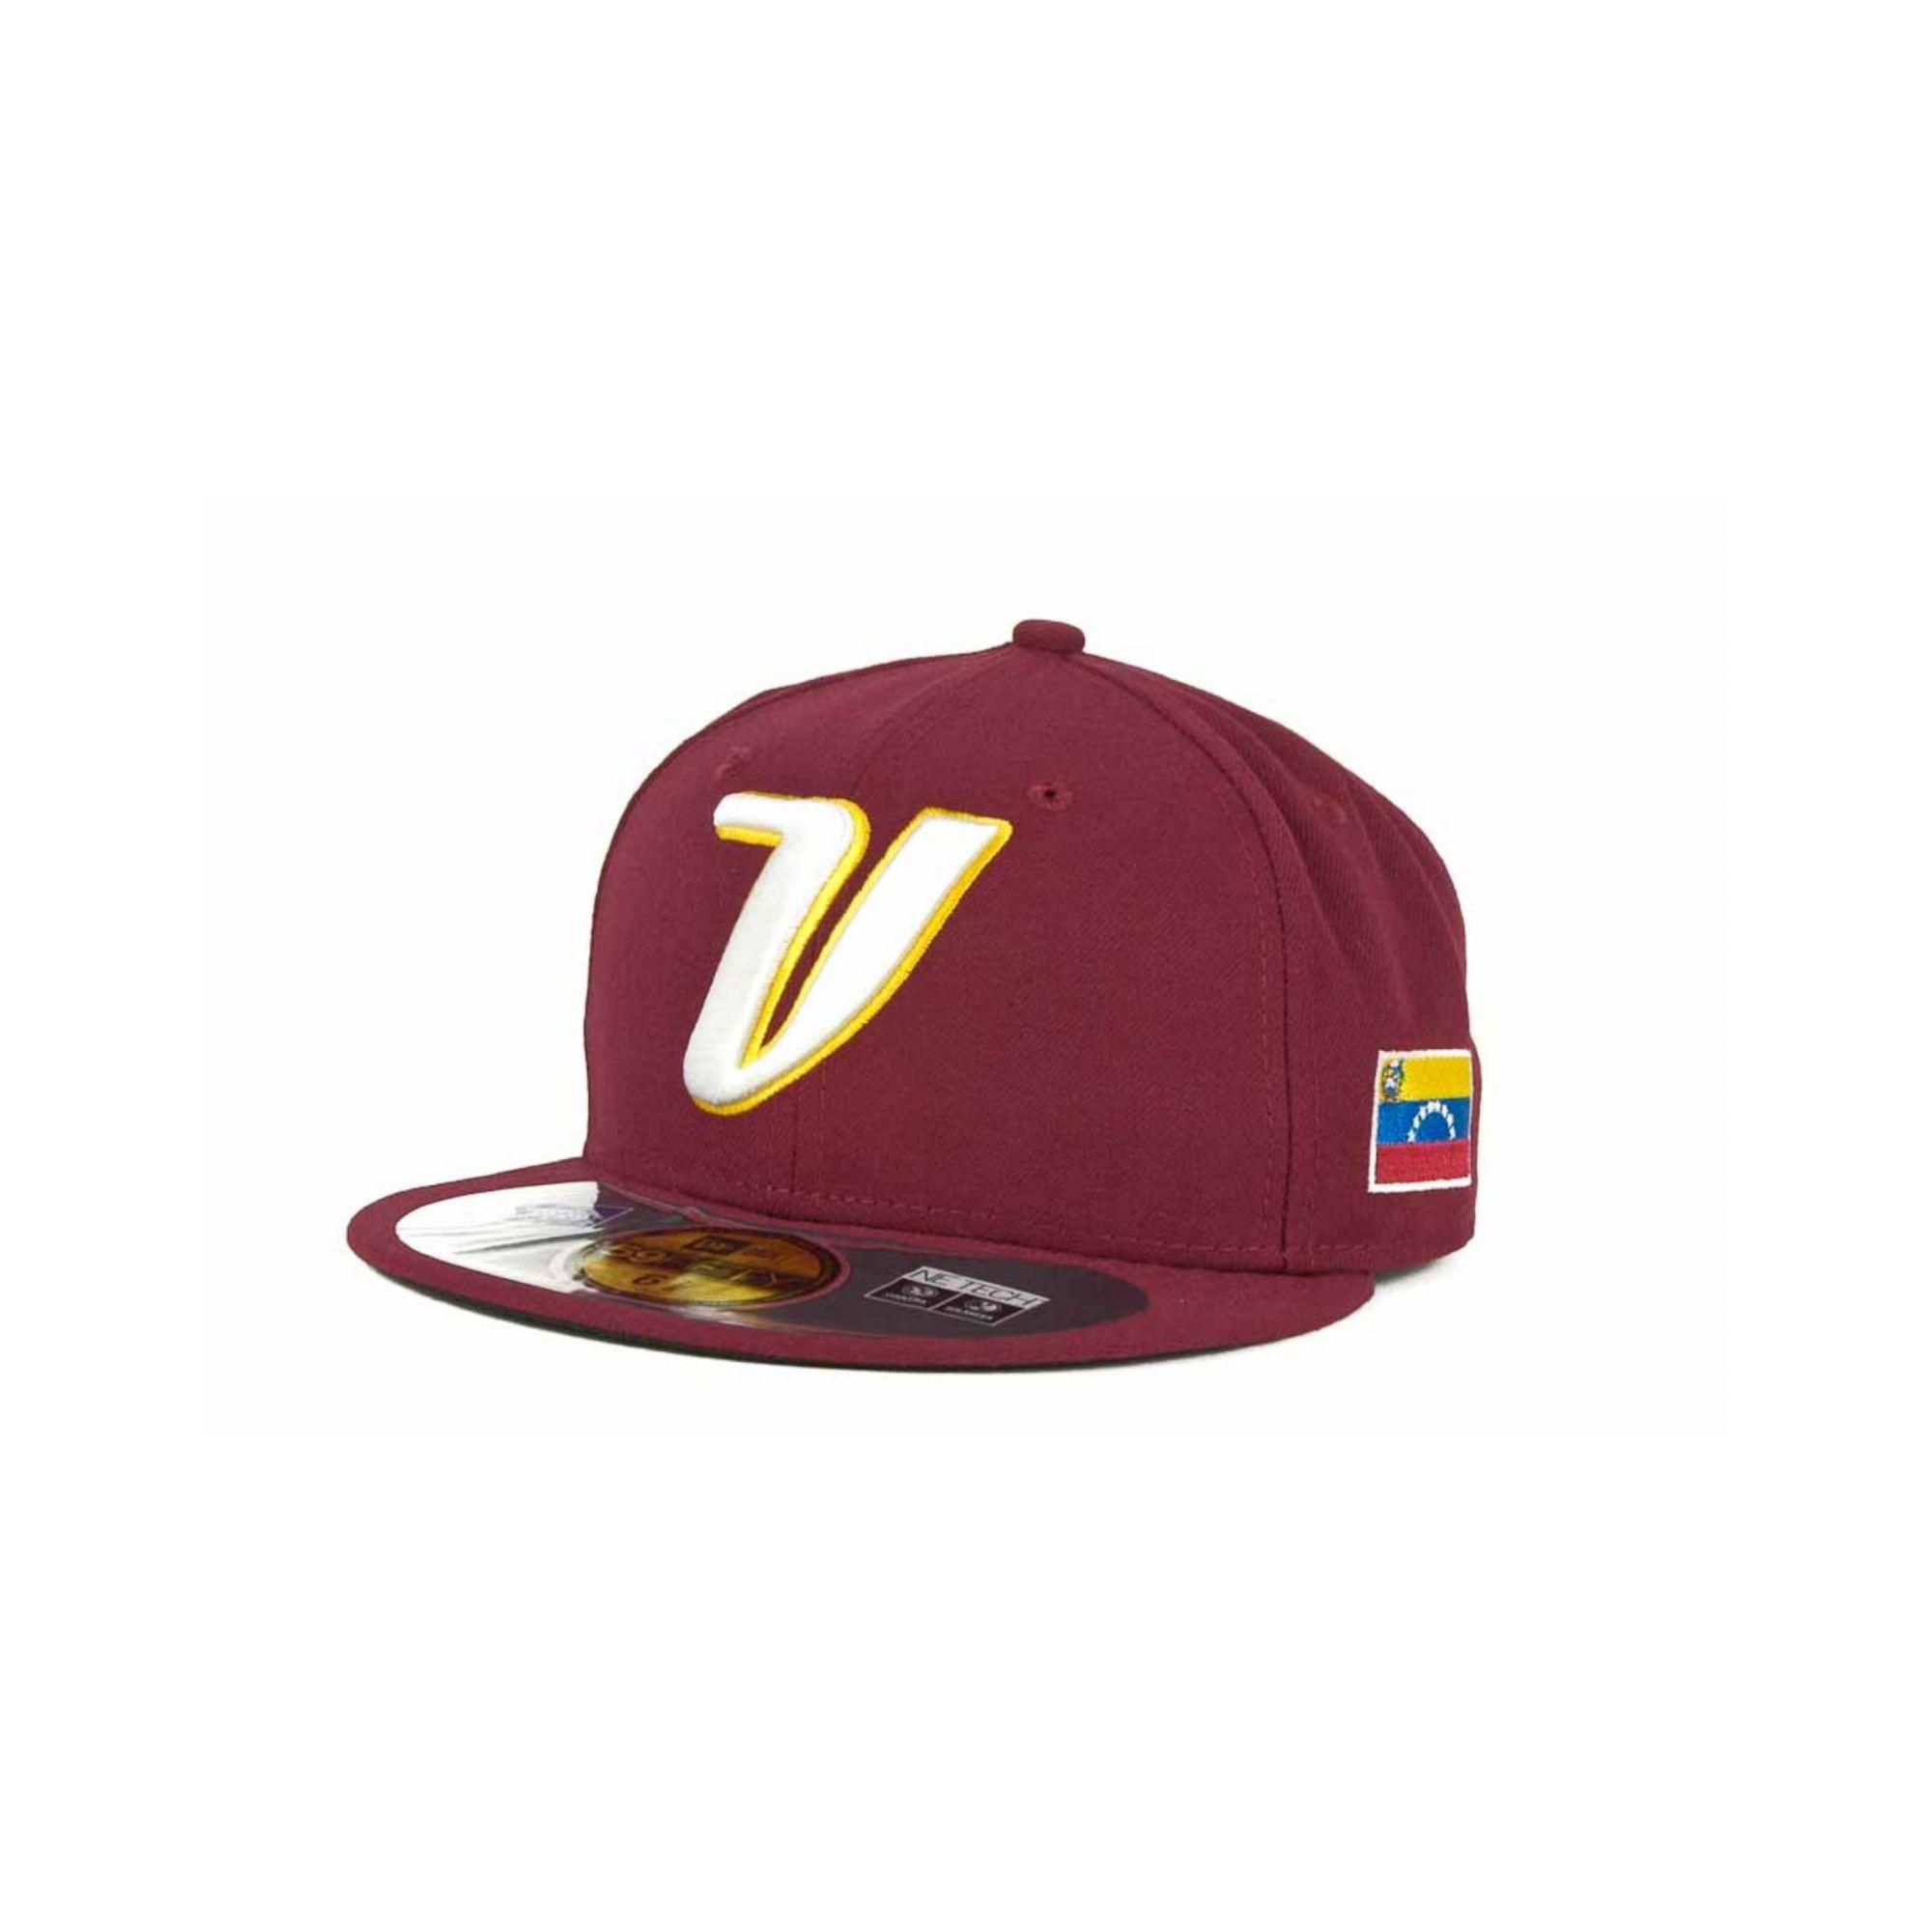 e3ffc1ece where to buy 2017 world baseball classic venezuela wbc new era ...